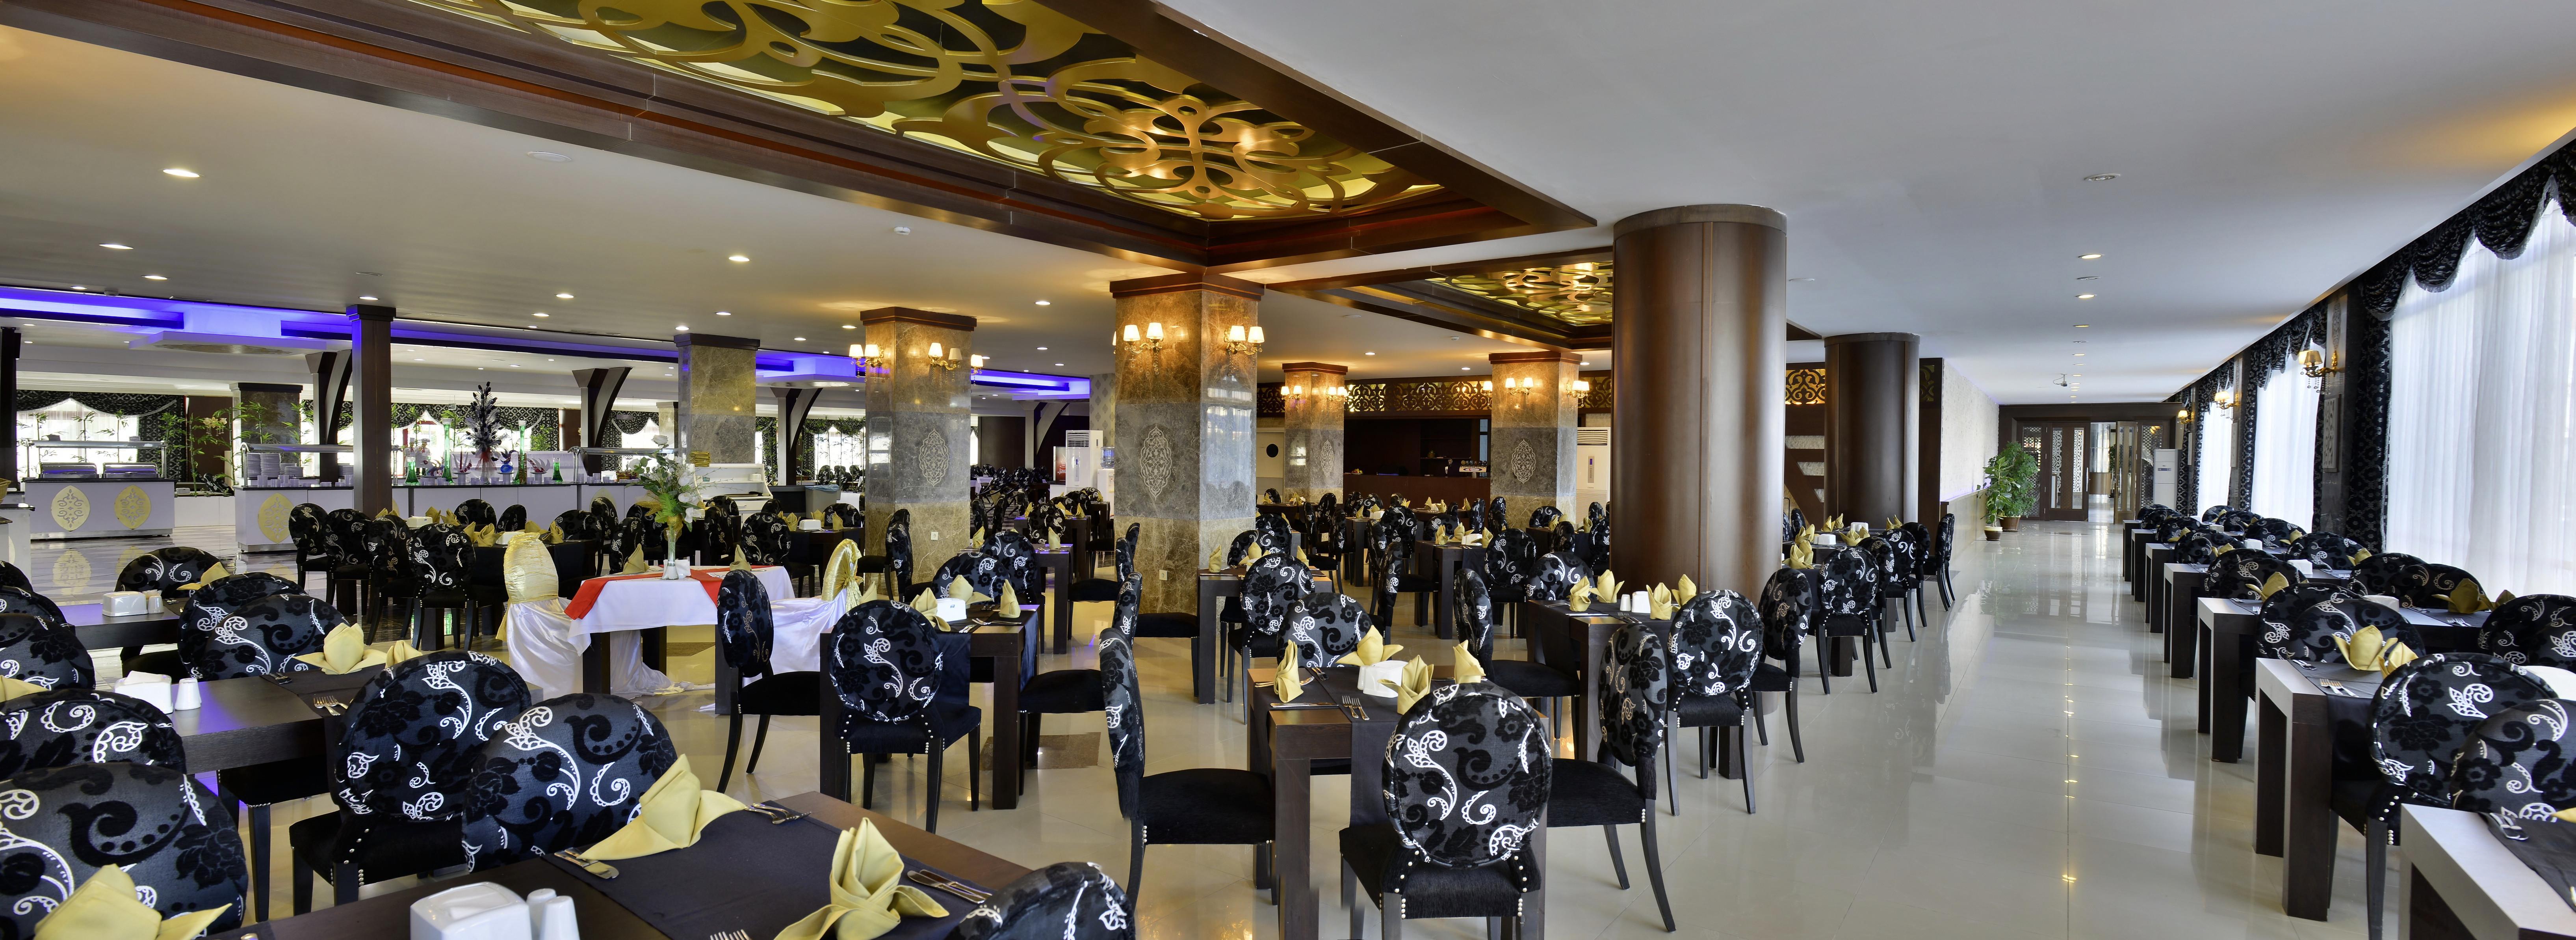 http://www.orextravel.sk/OREX/hotelphotos/side-royal-paradise-general-0027.jpg